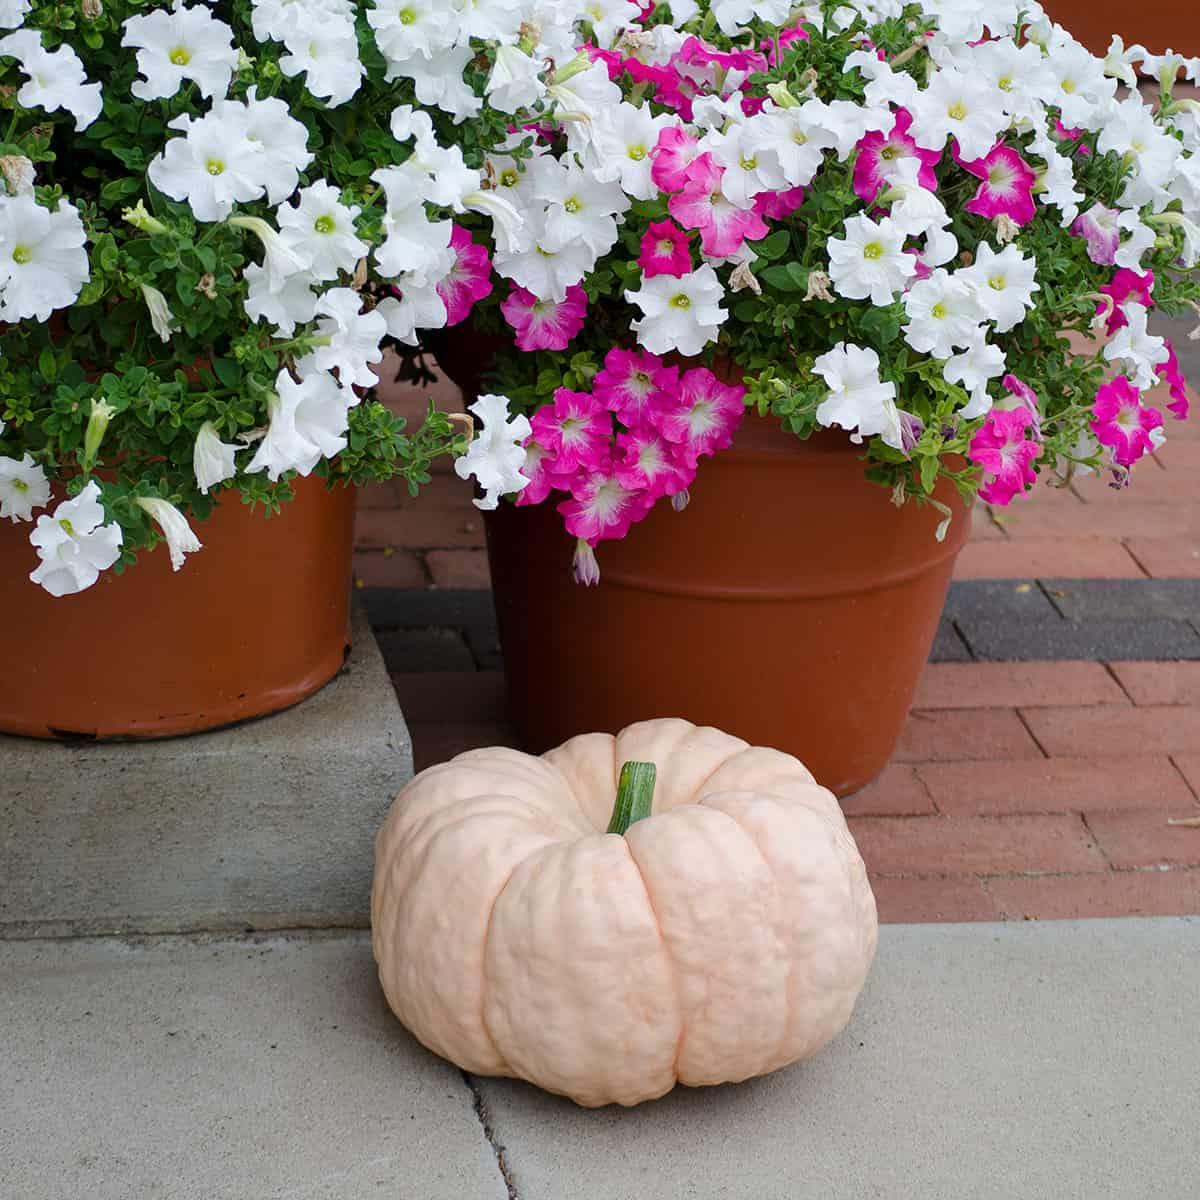 Pink Pumpkins: Changing The World, One Pumpkin At A Time